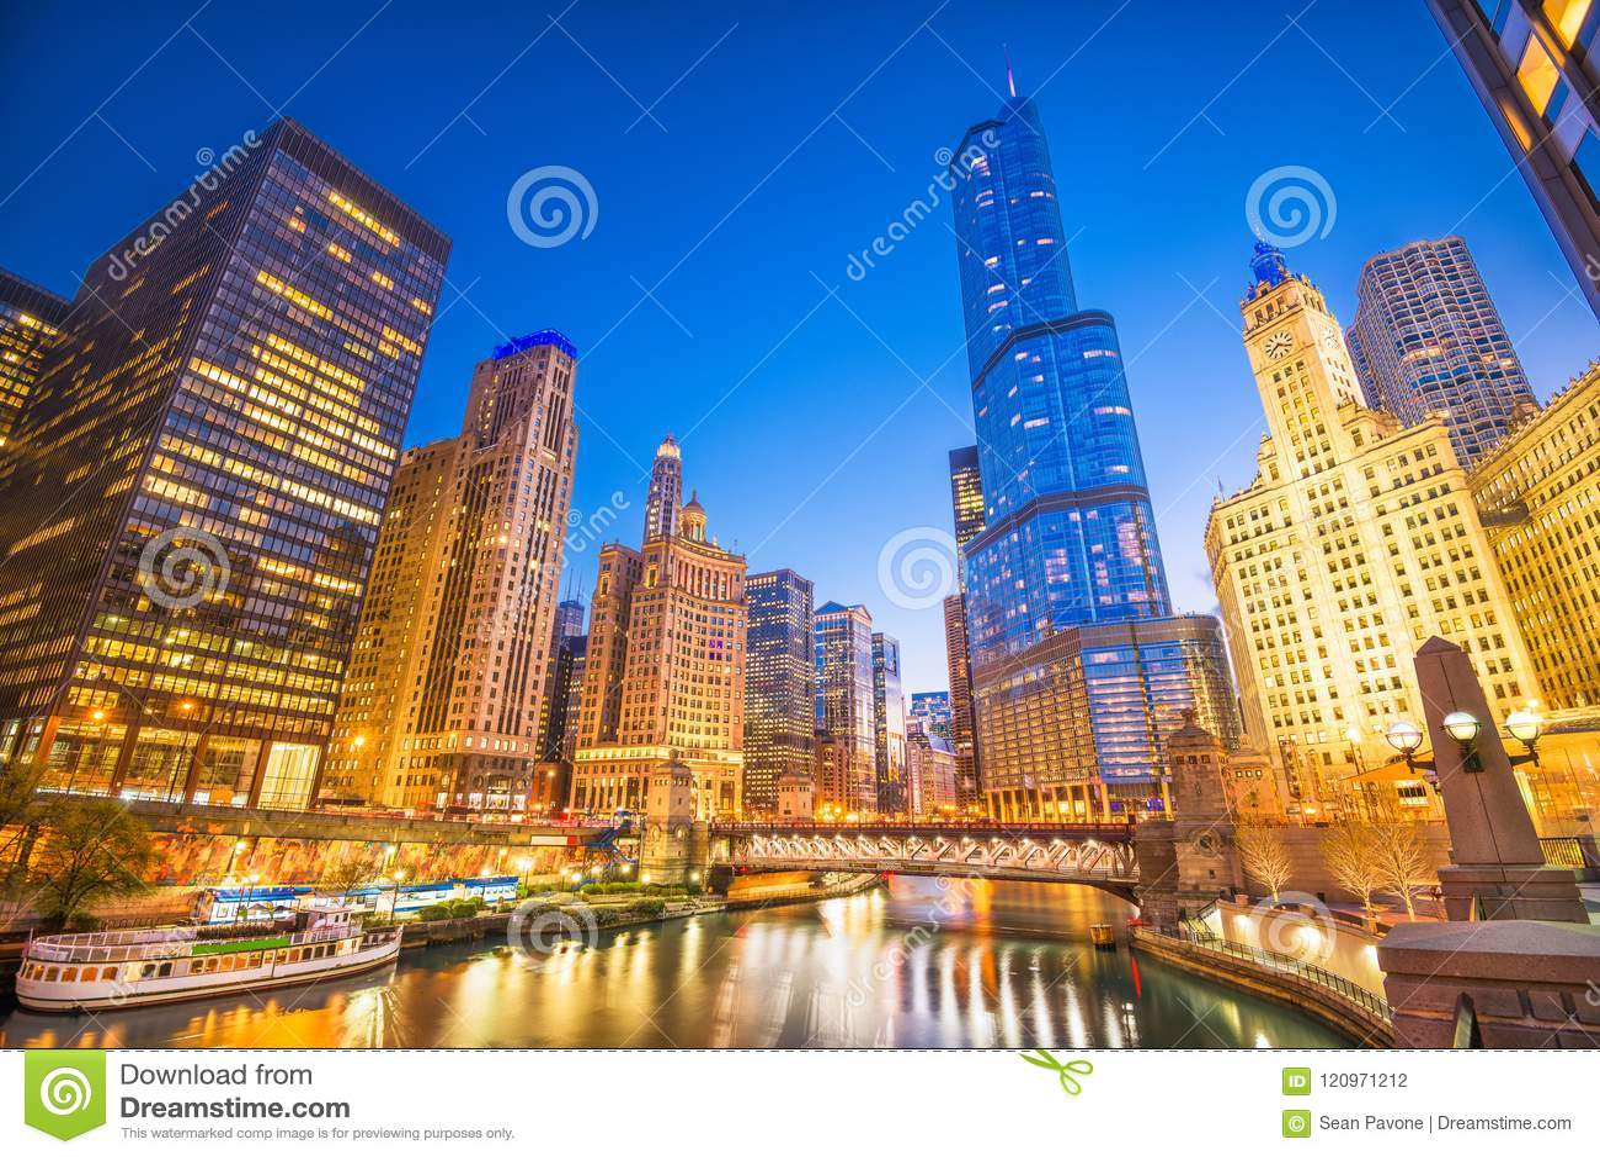 Paisaje urbano de Chicago, Illinois, los E.E.U.U.